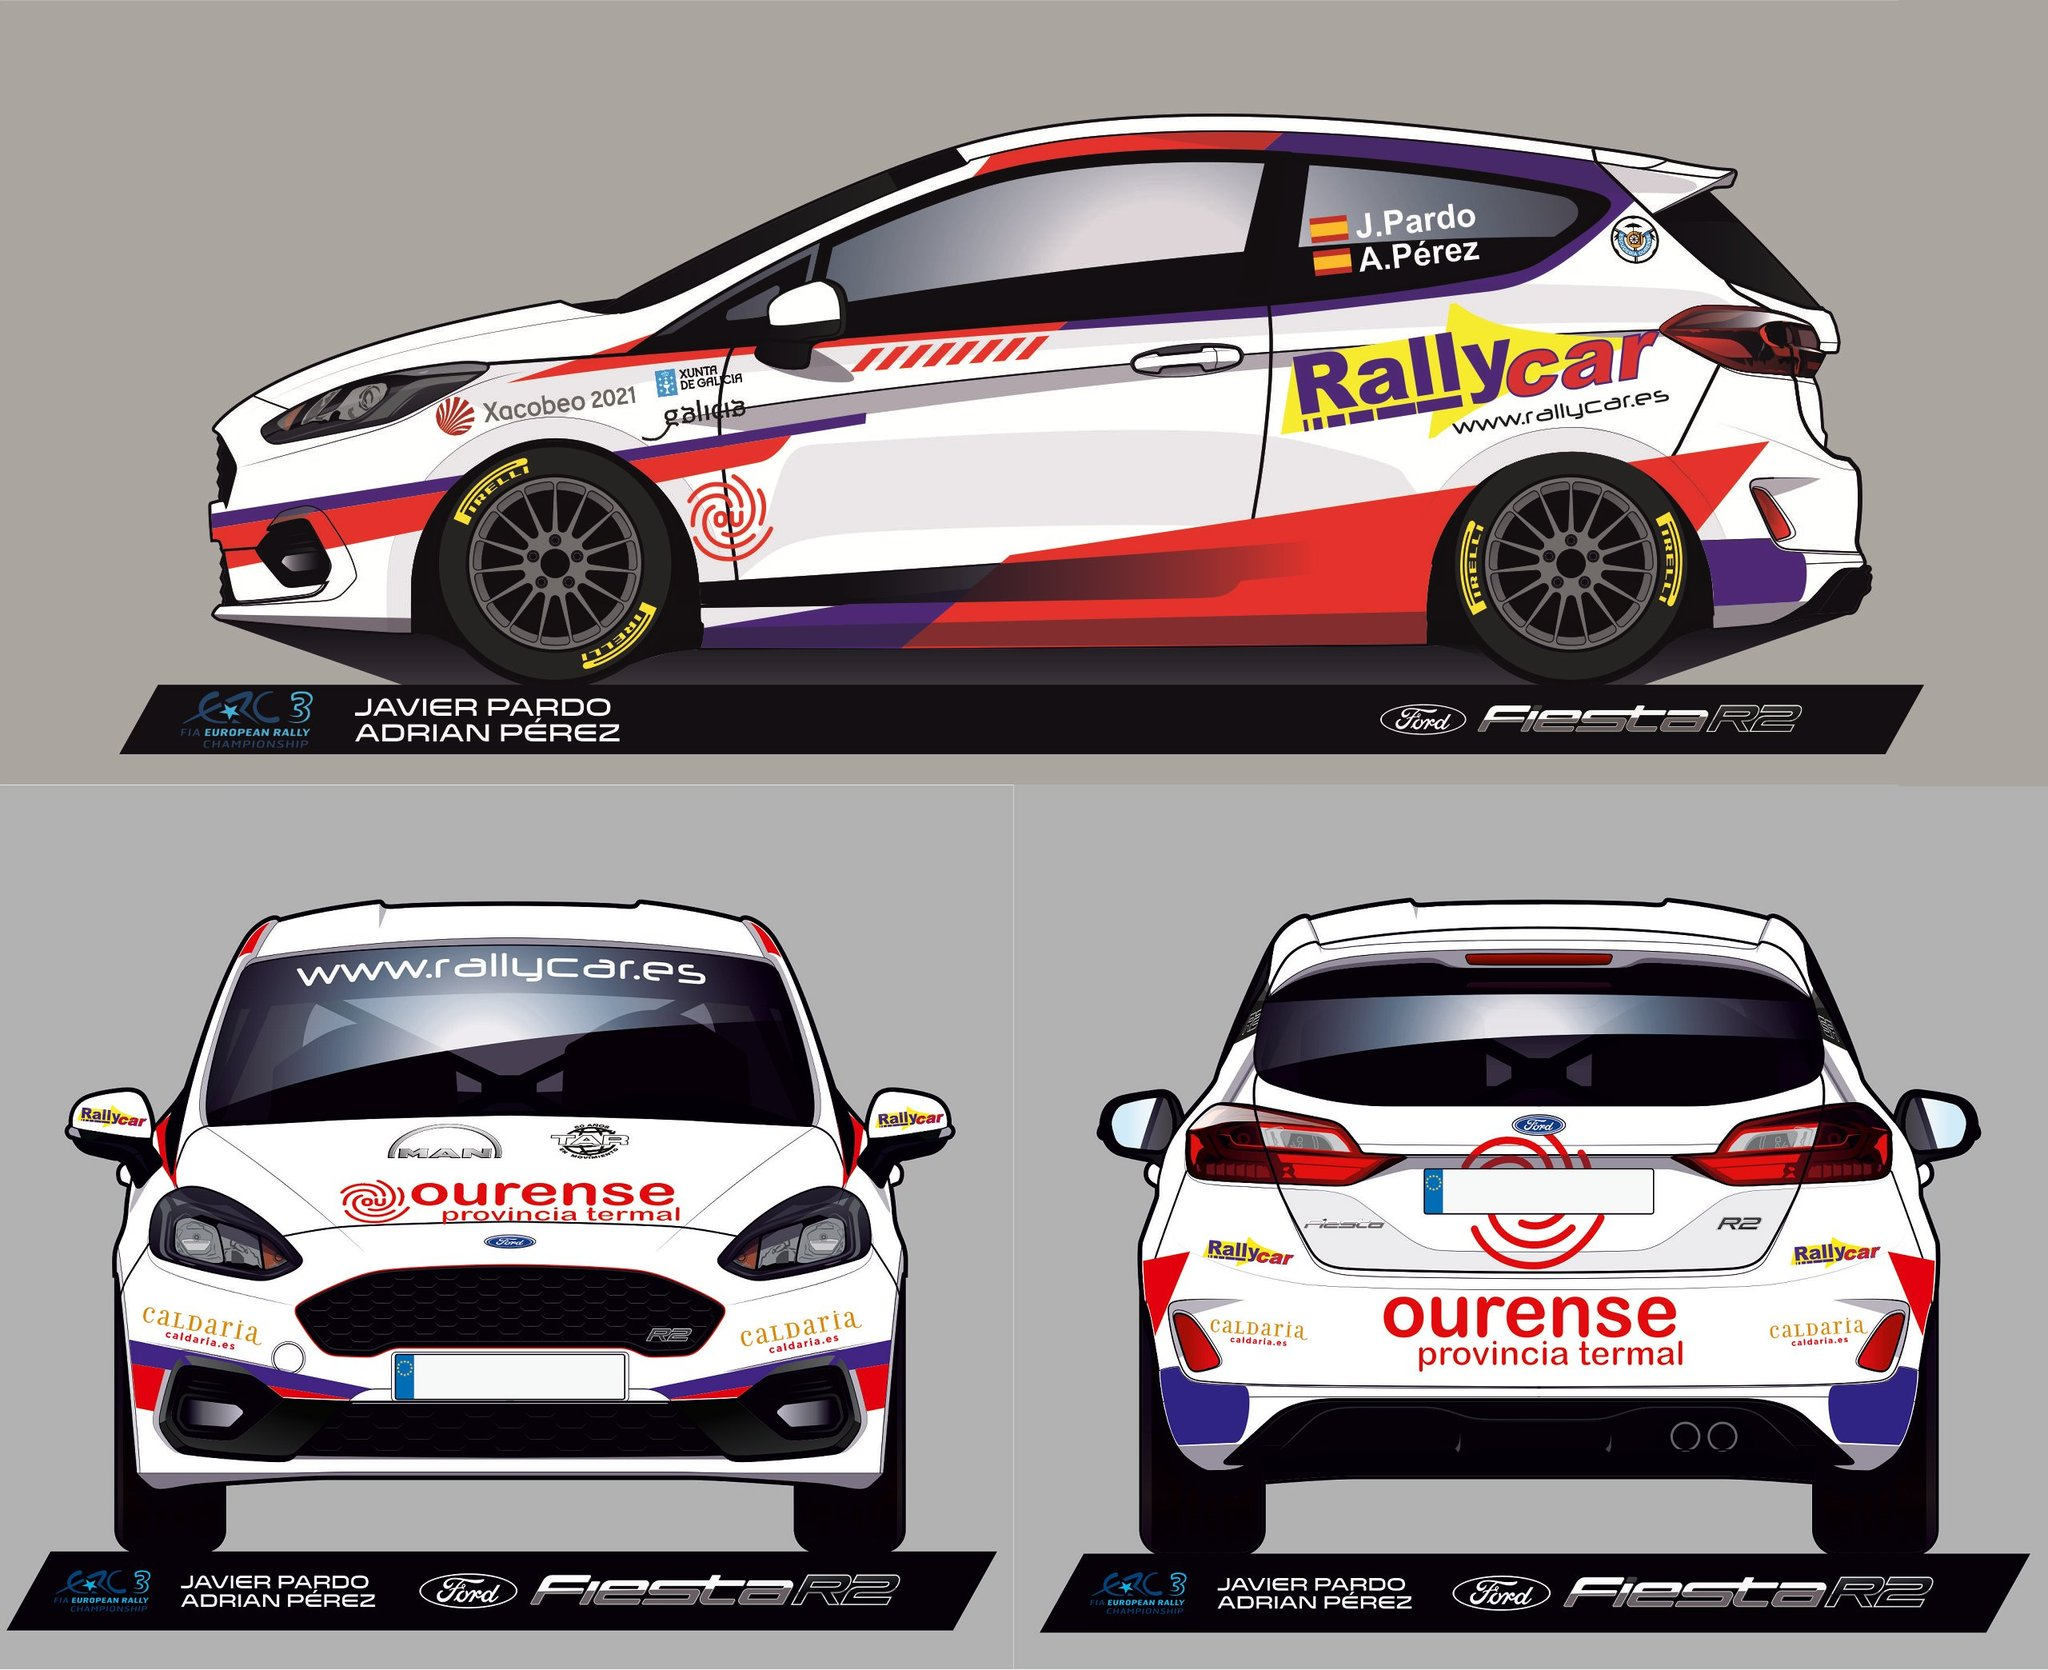 FIA European Rally Championship: Temporada 2020 - Página 2 EQZ7pxDXkAAZsqo?format=jpg&name=4096x4096